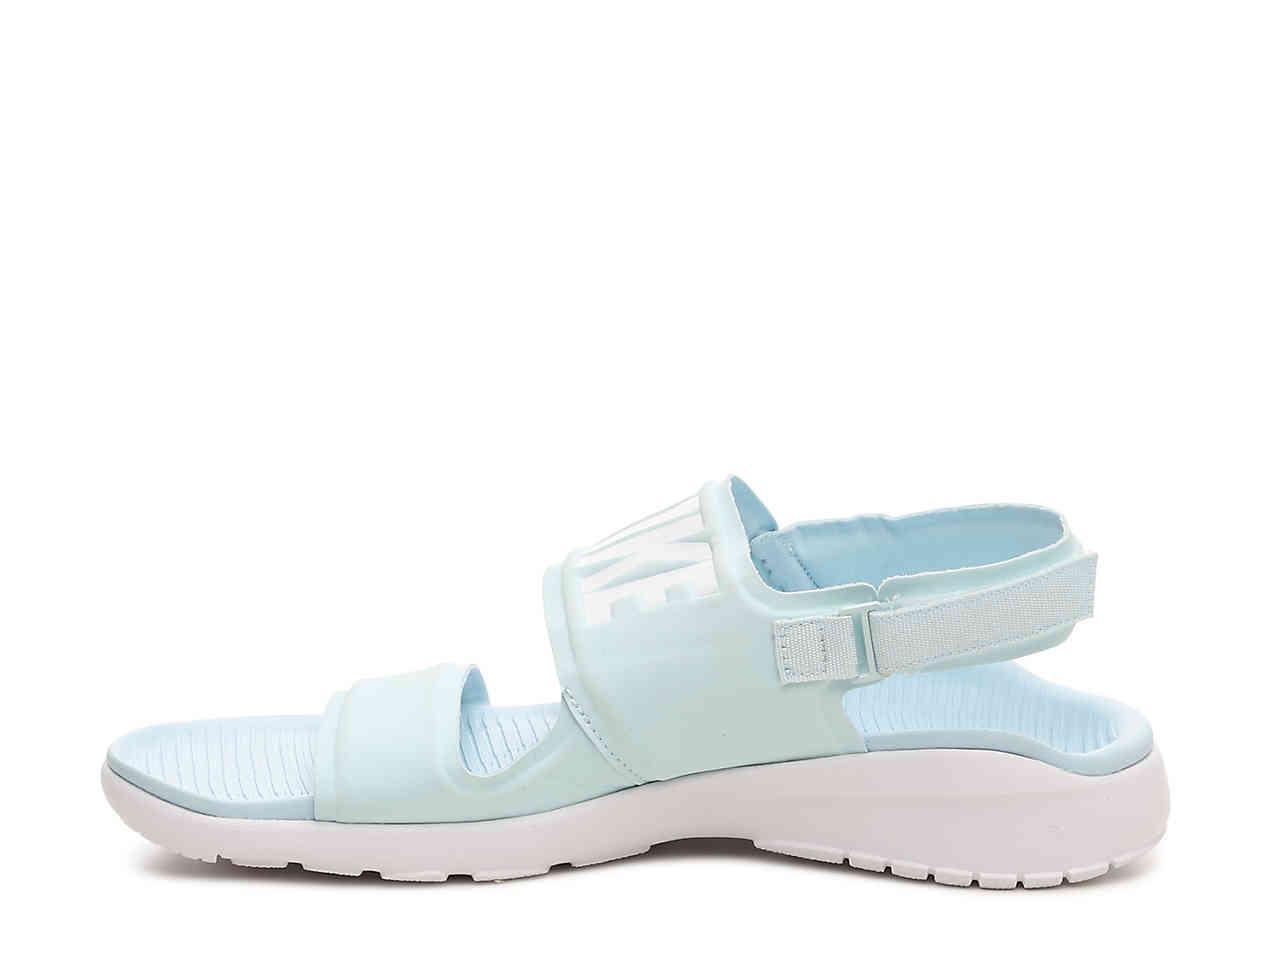 597be87a9dda Lyst - Nike Tanjun Sport Sandal in Blue